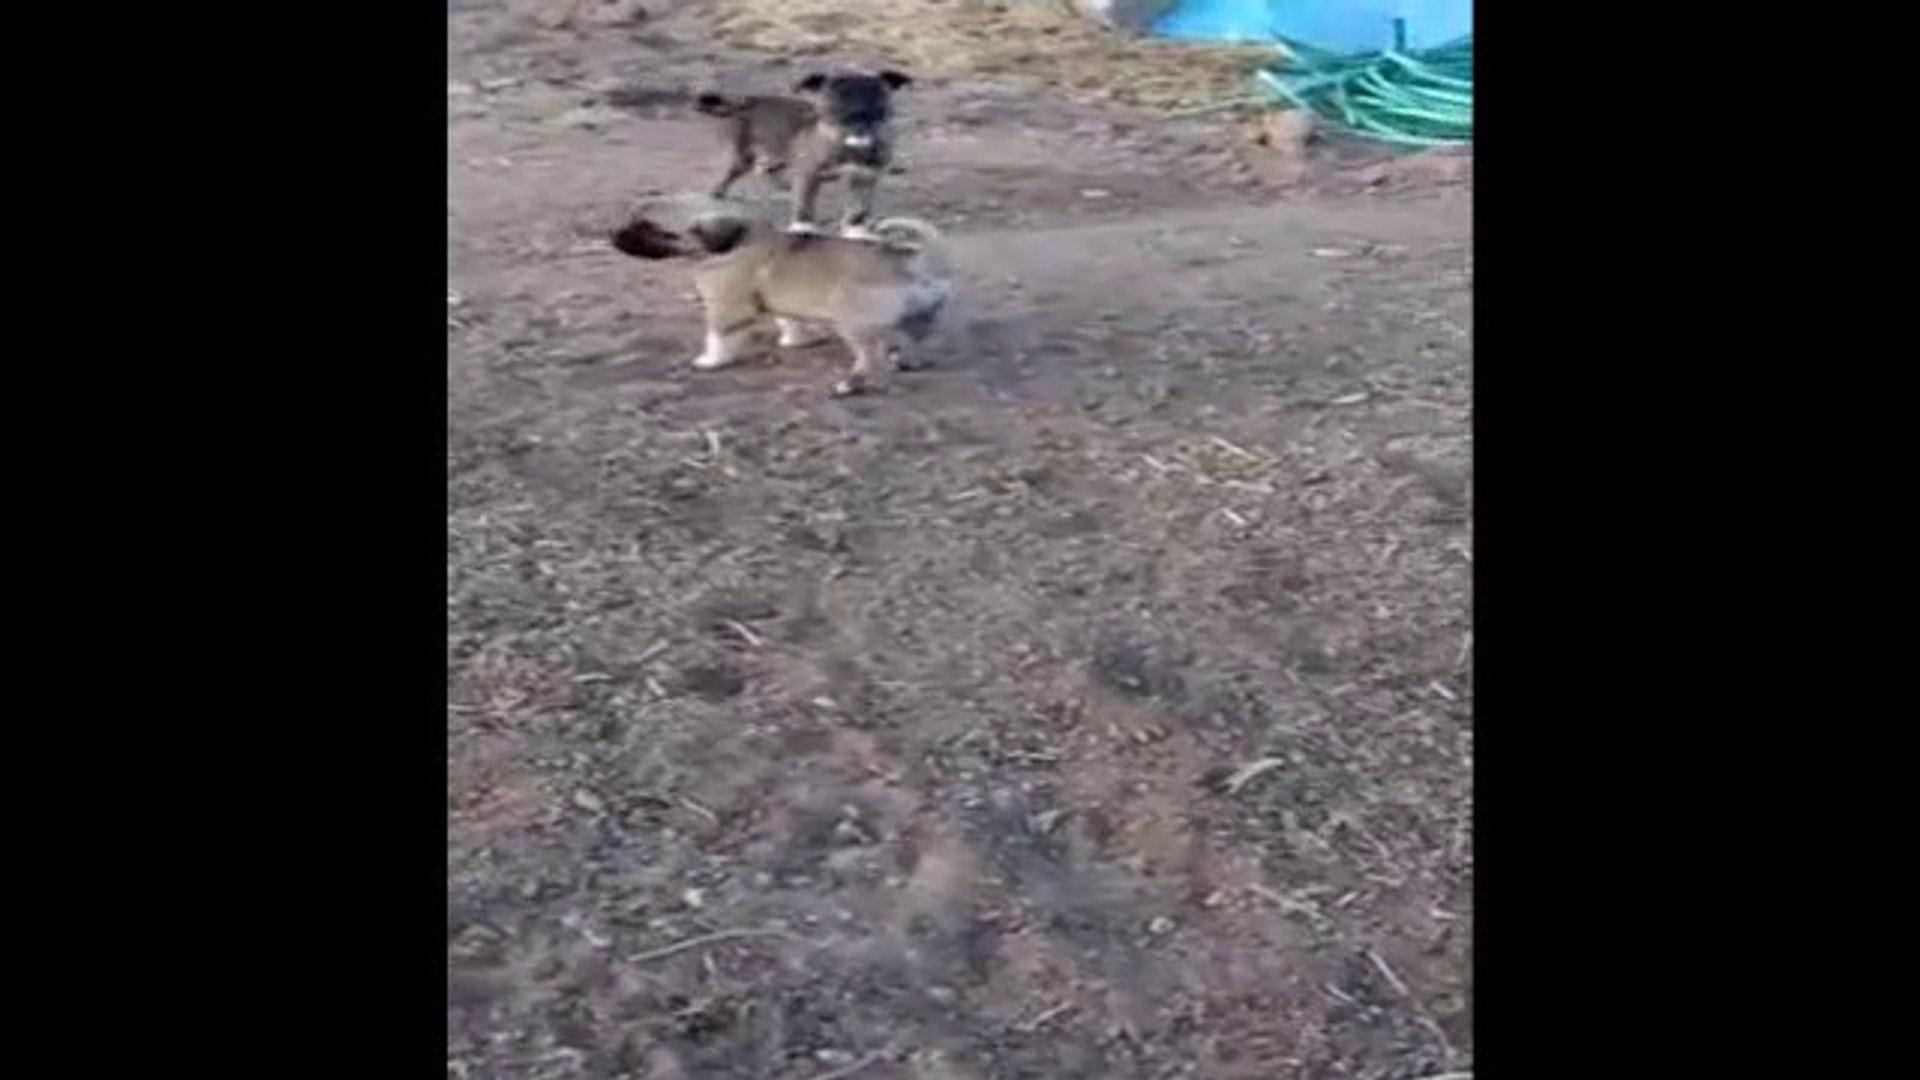 COK SiNiRLi SiVAS KANGAL KOPEGi YAVRUSU - VERY ANGRY SiVAS KANGAL DOG PUPPY